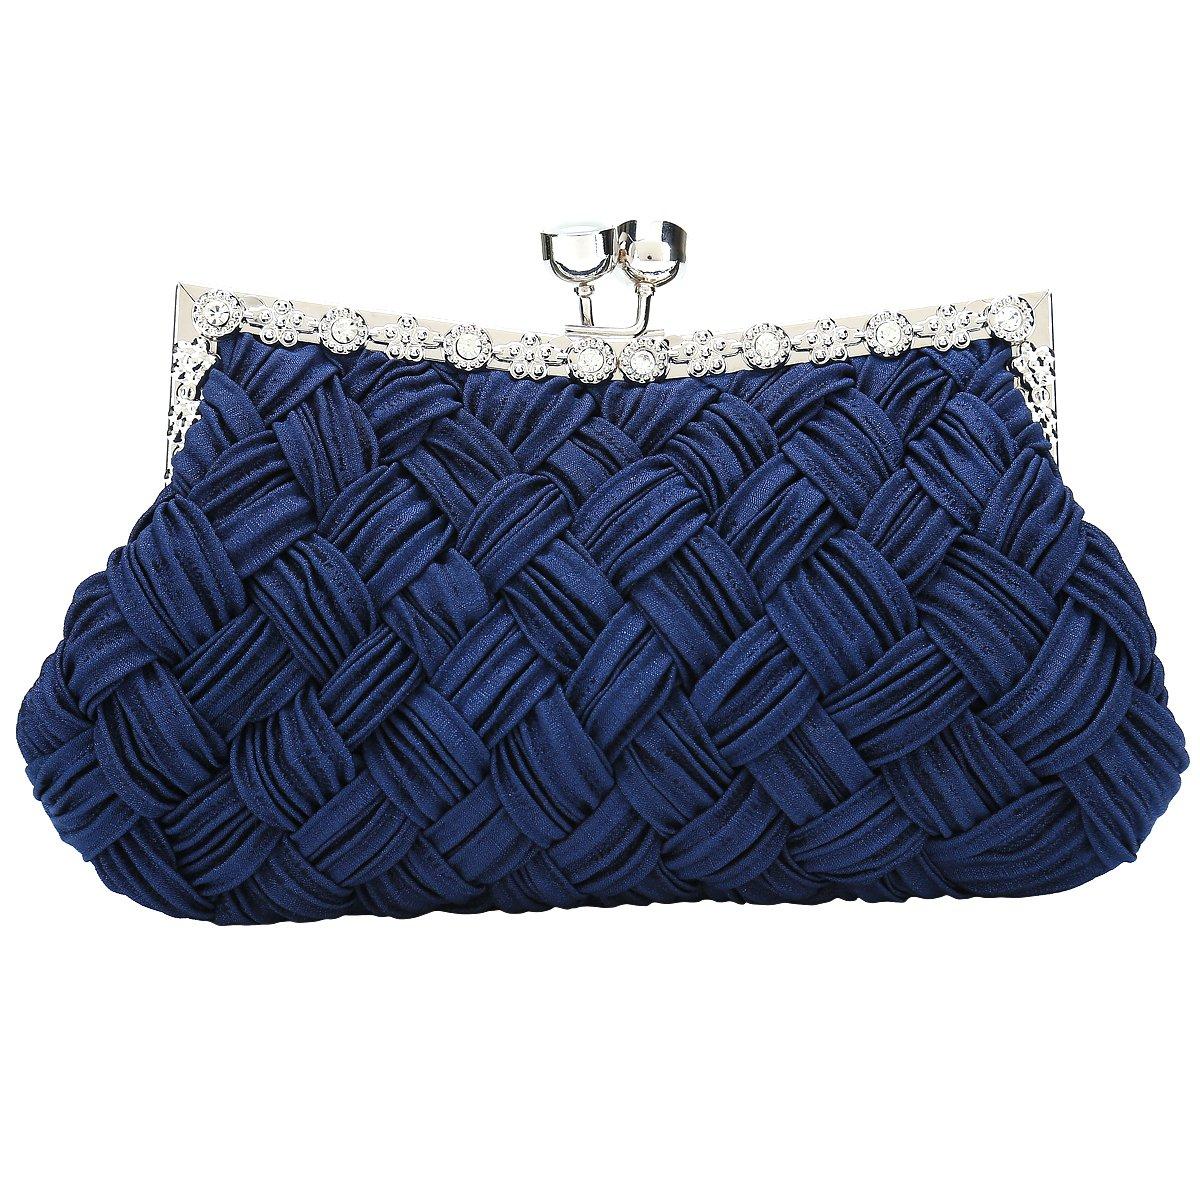 Charming Tailor Evening Bag Women Classic Clutch Woven Wedding Party Purse (Navy Blue)